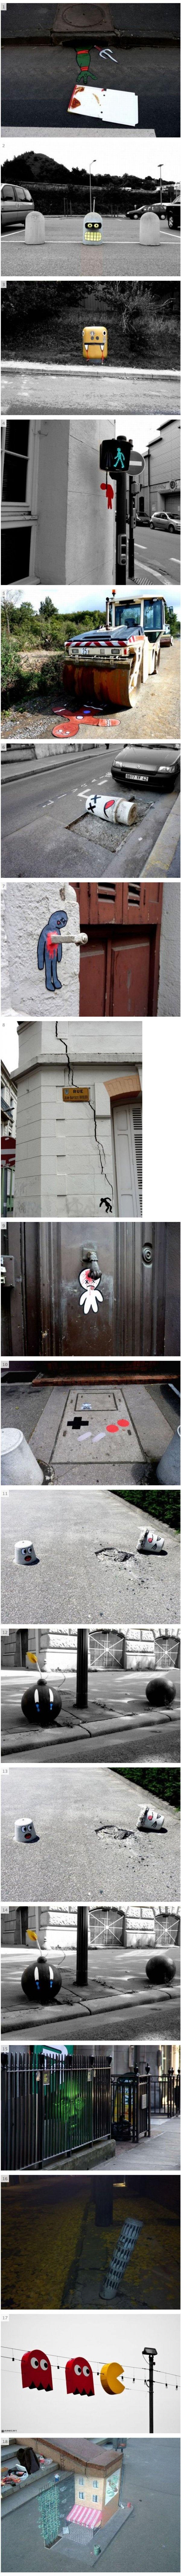 Kreative Straßenkunst